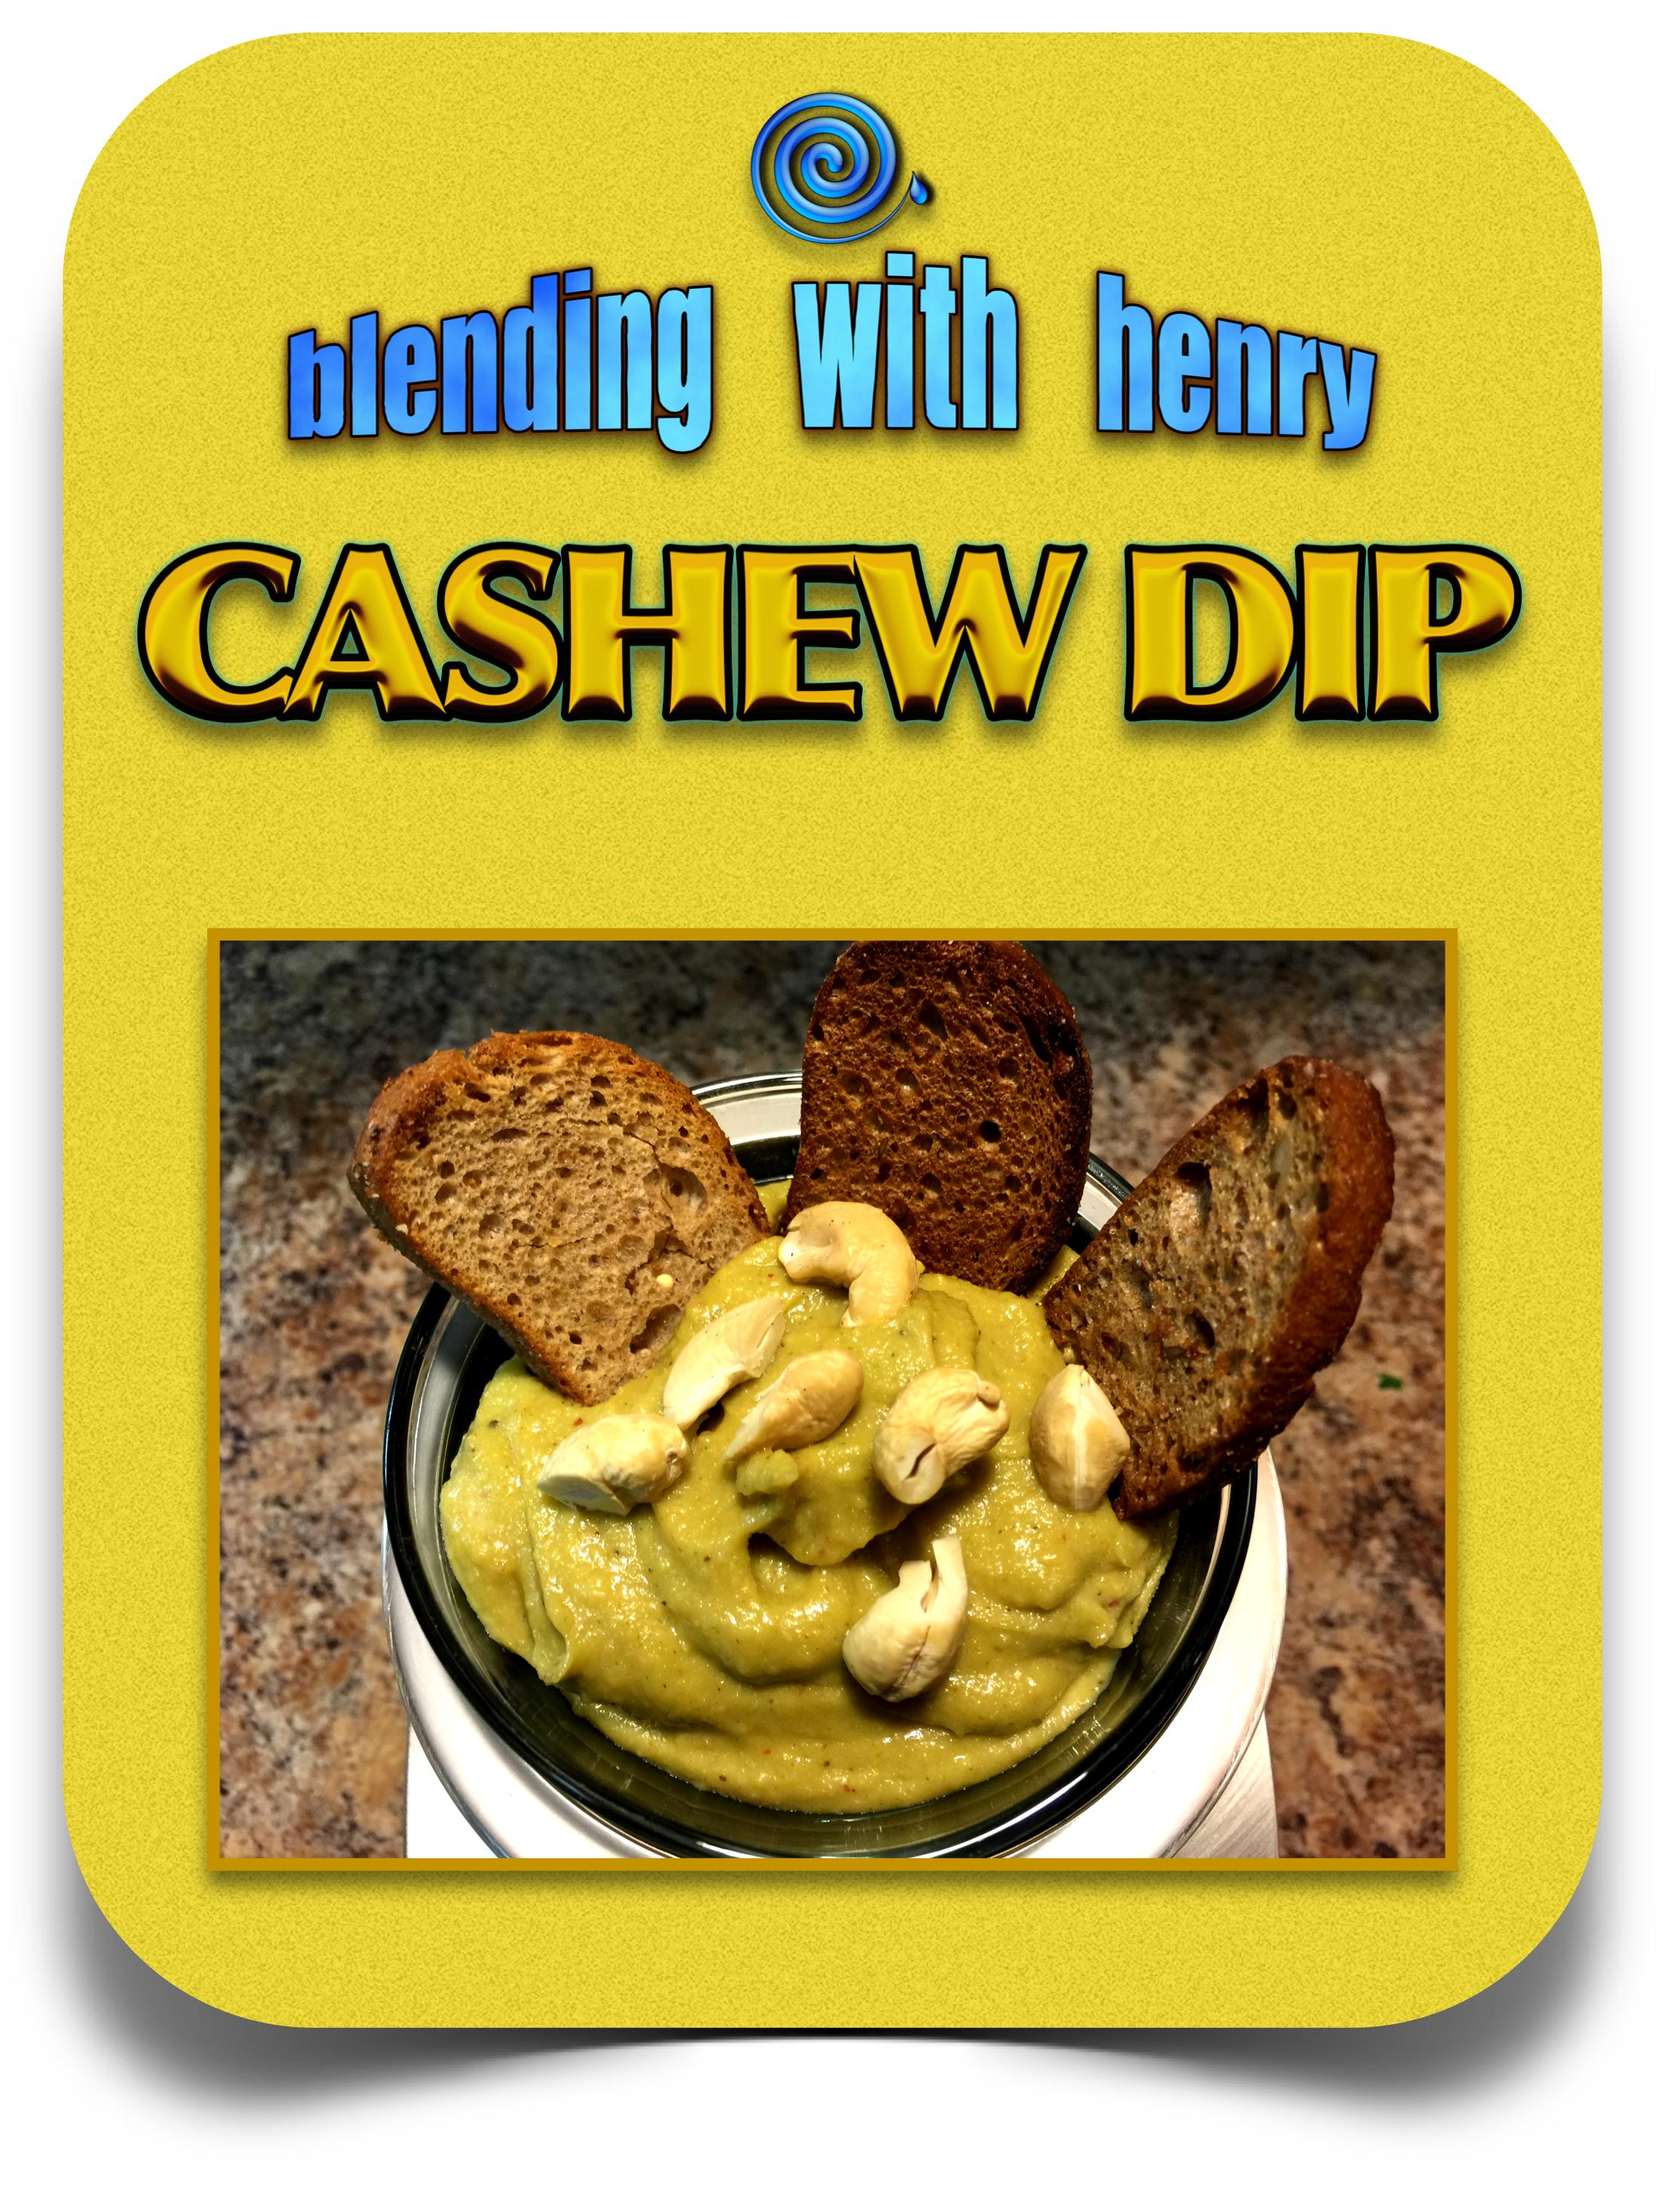 CASHEW DIP.png